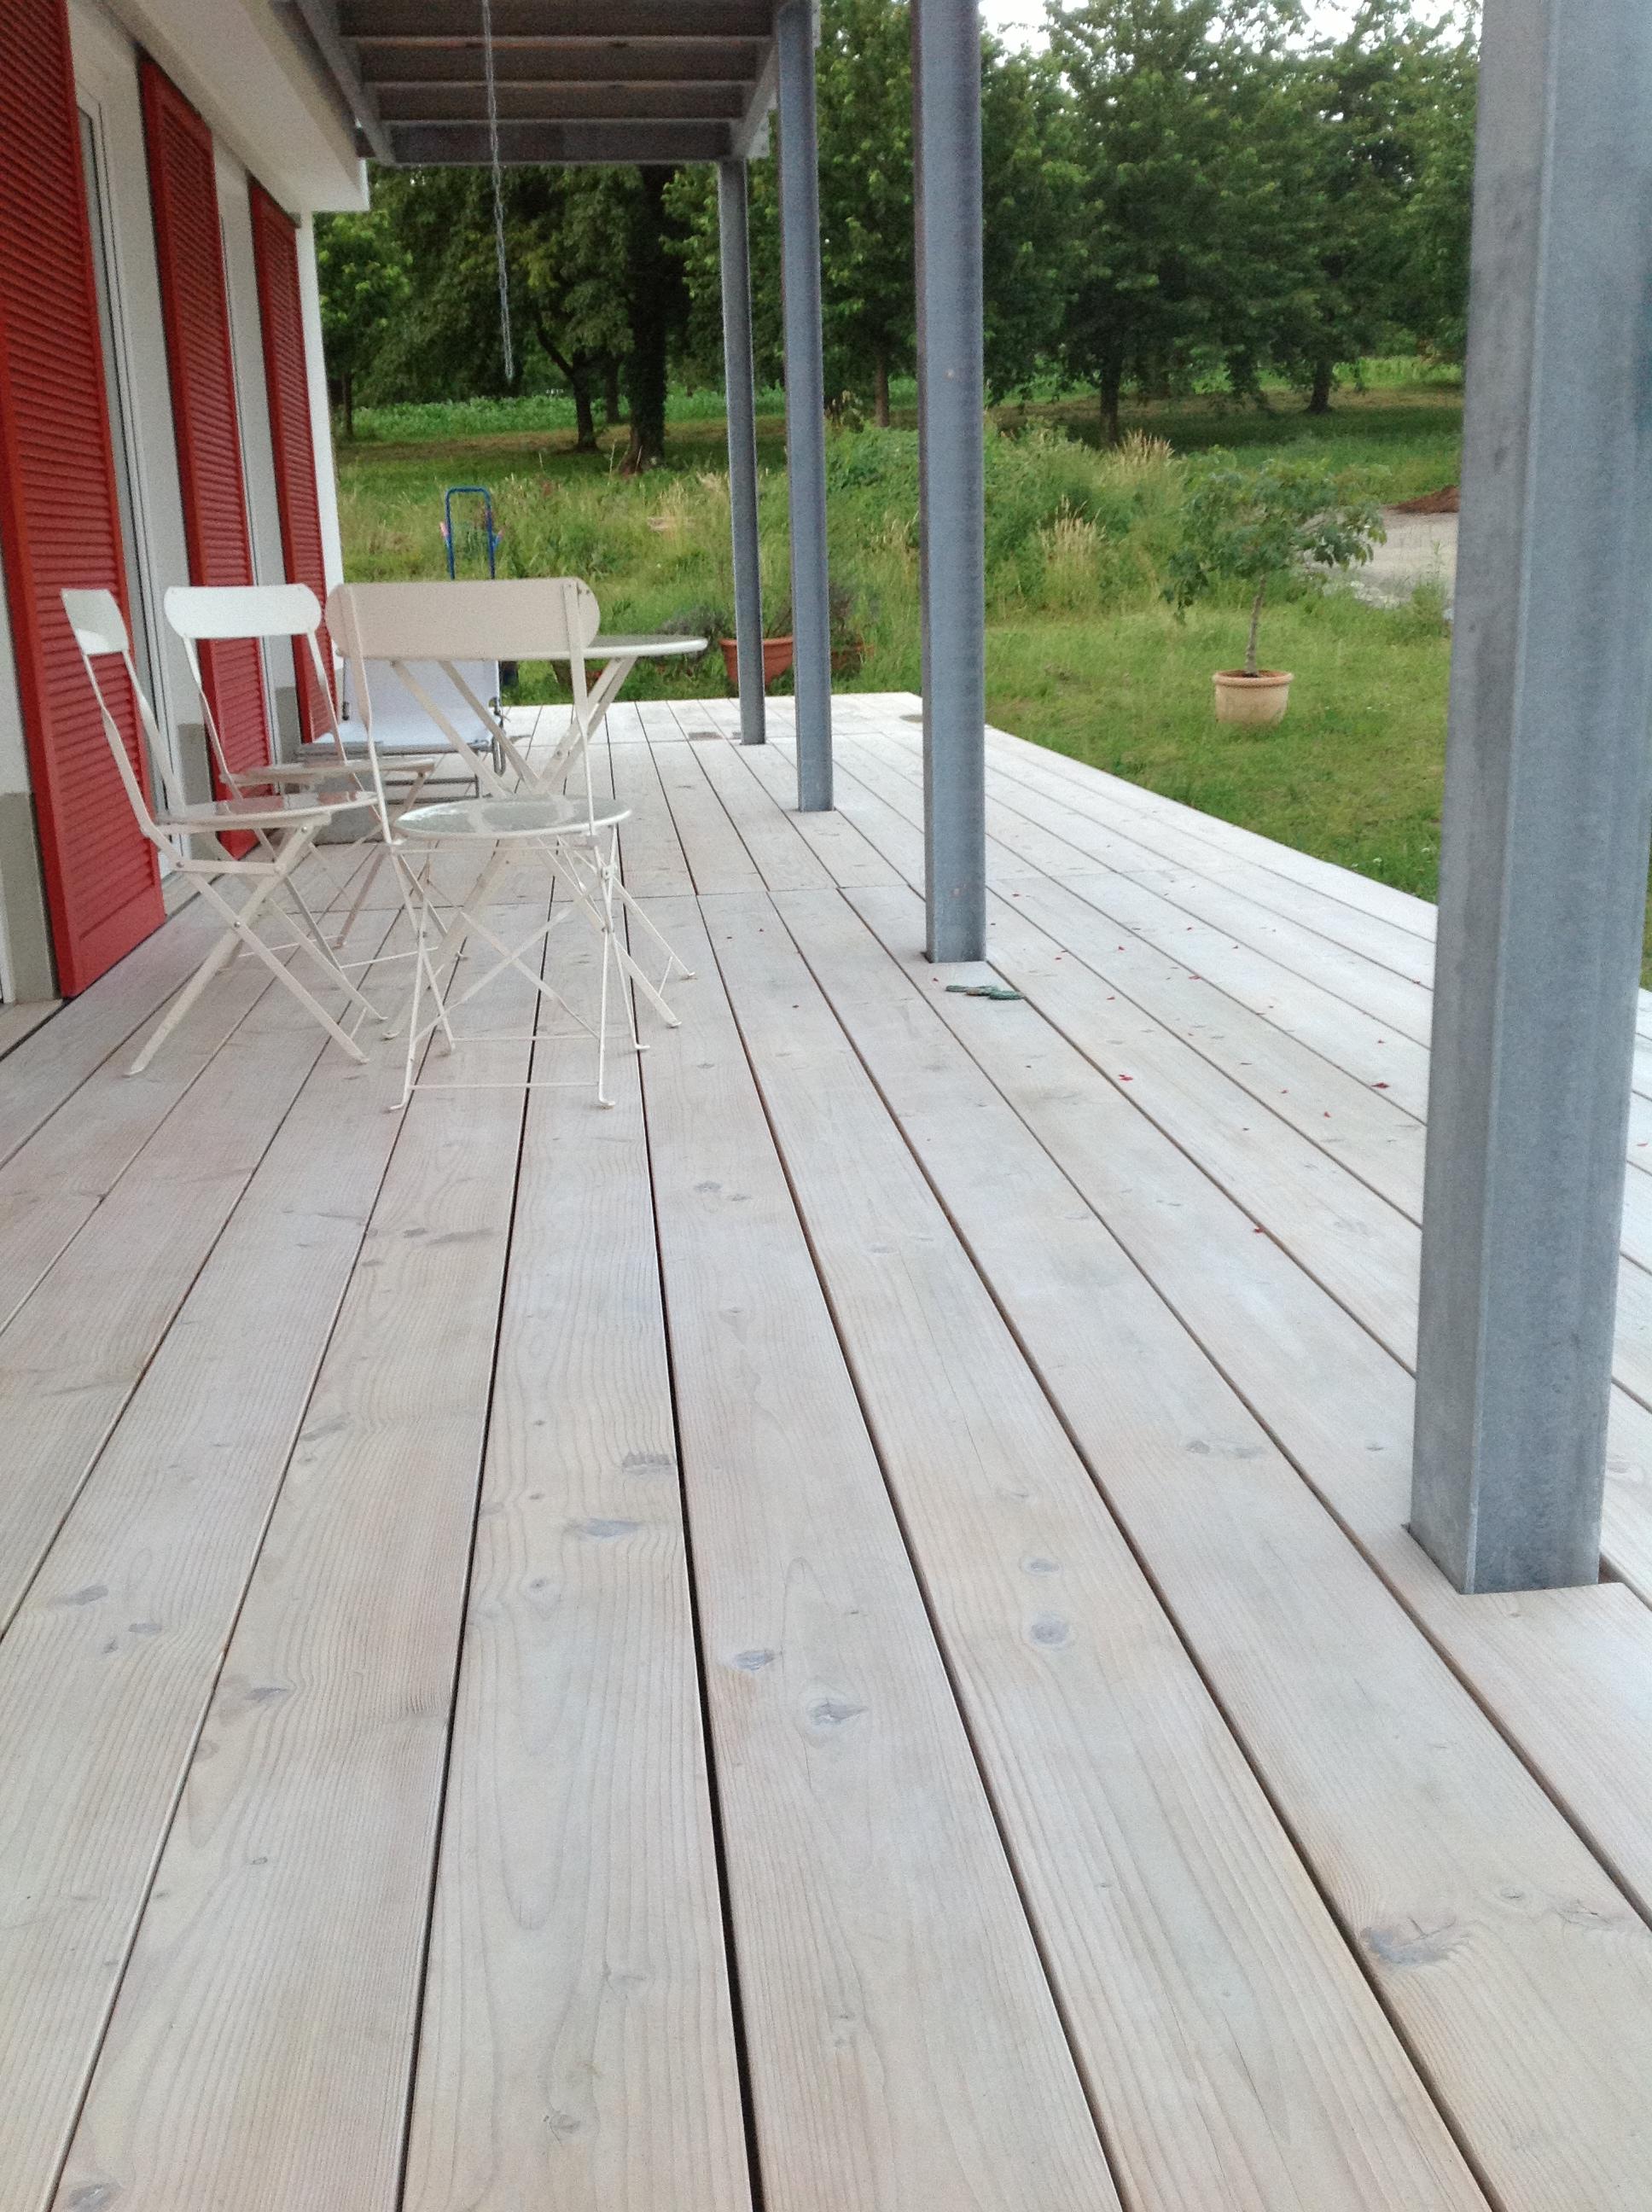 Douglasie Holzterrassen 6m lang  BS-Holzdesign